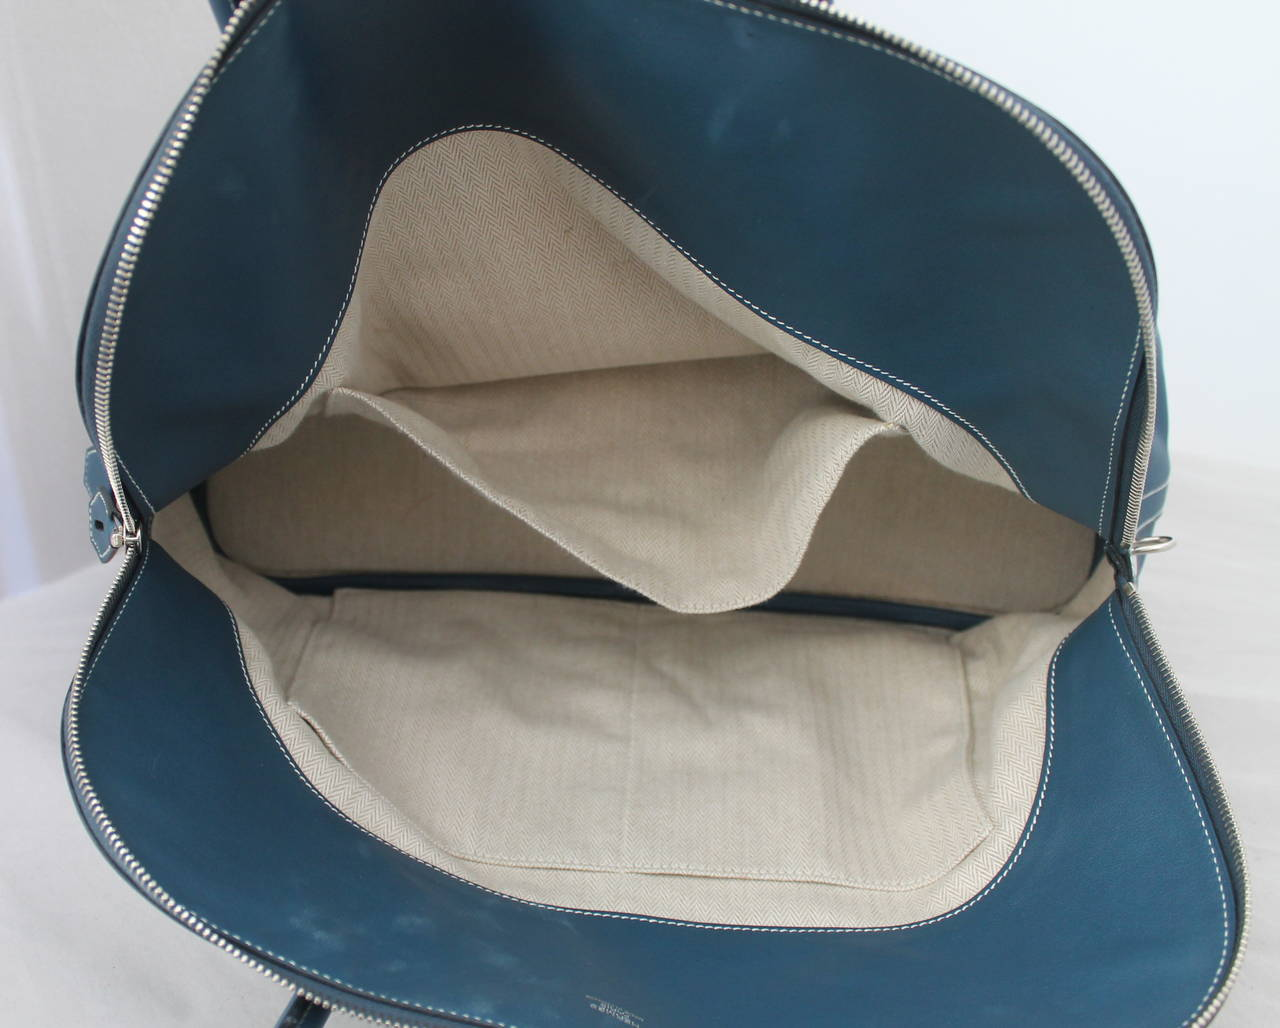 Hermes Thalassa Blue 40cm Veau Swift Bolide Handbag circa 2012 In Good Condition For Sale In Palm Beach, FL